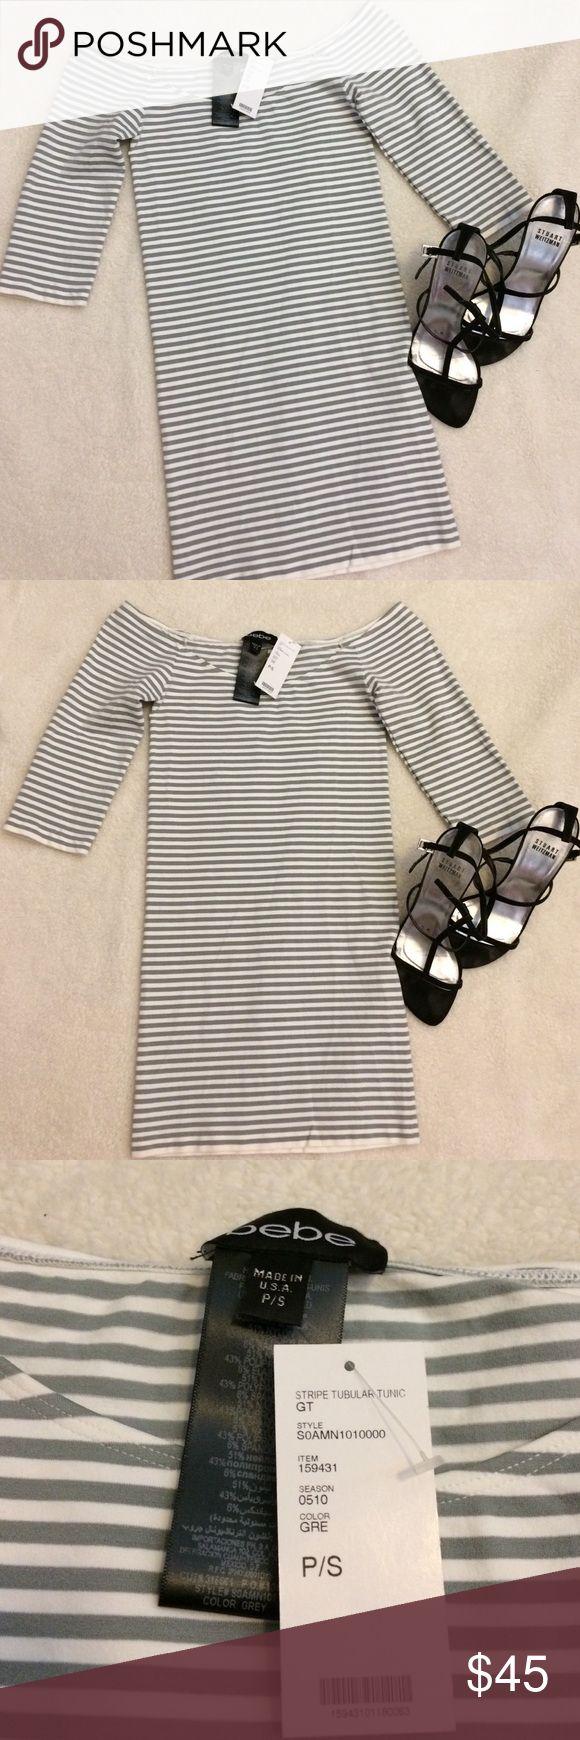 Bebe Dress Bebe Skin Tight Dress - Gray and White - Stripped - Petite Small - Brand New bebe Dresses Maxi